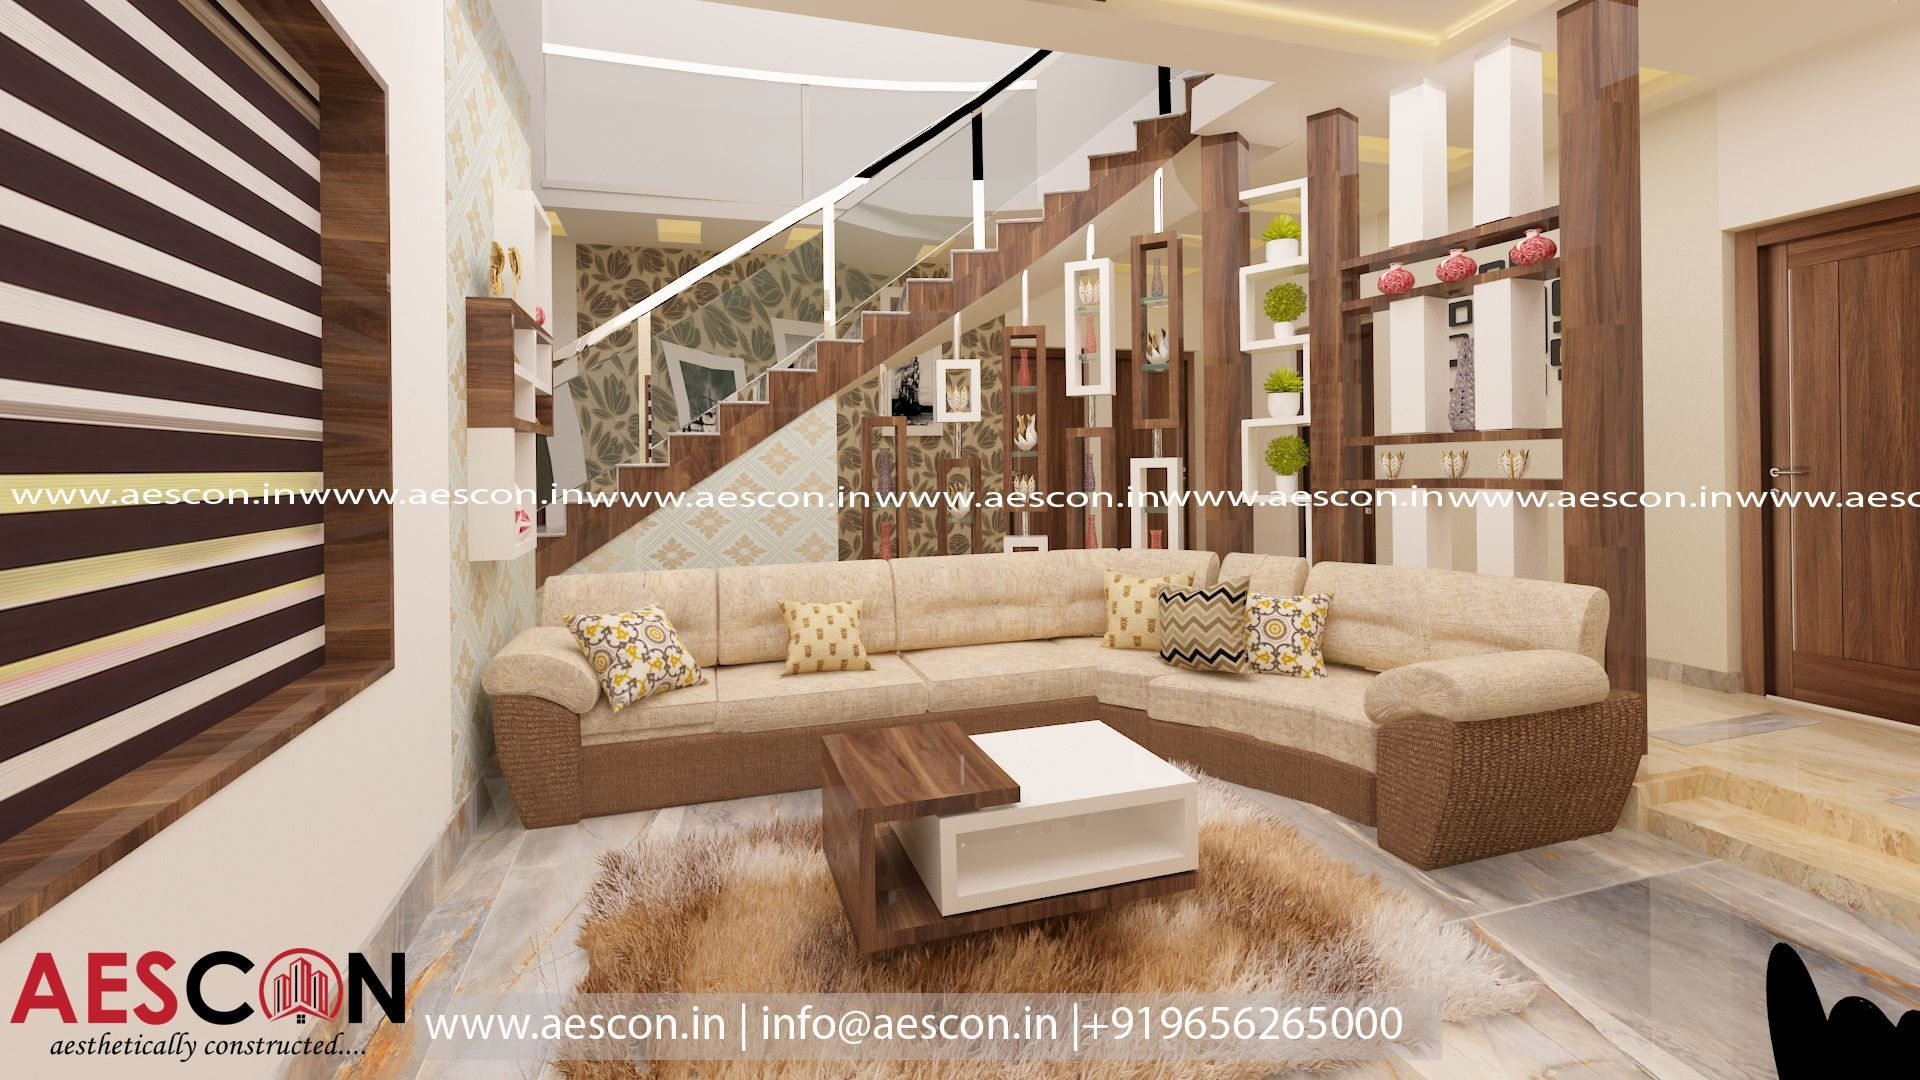 . Aescon is a team of creative interior designers  decorators and